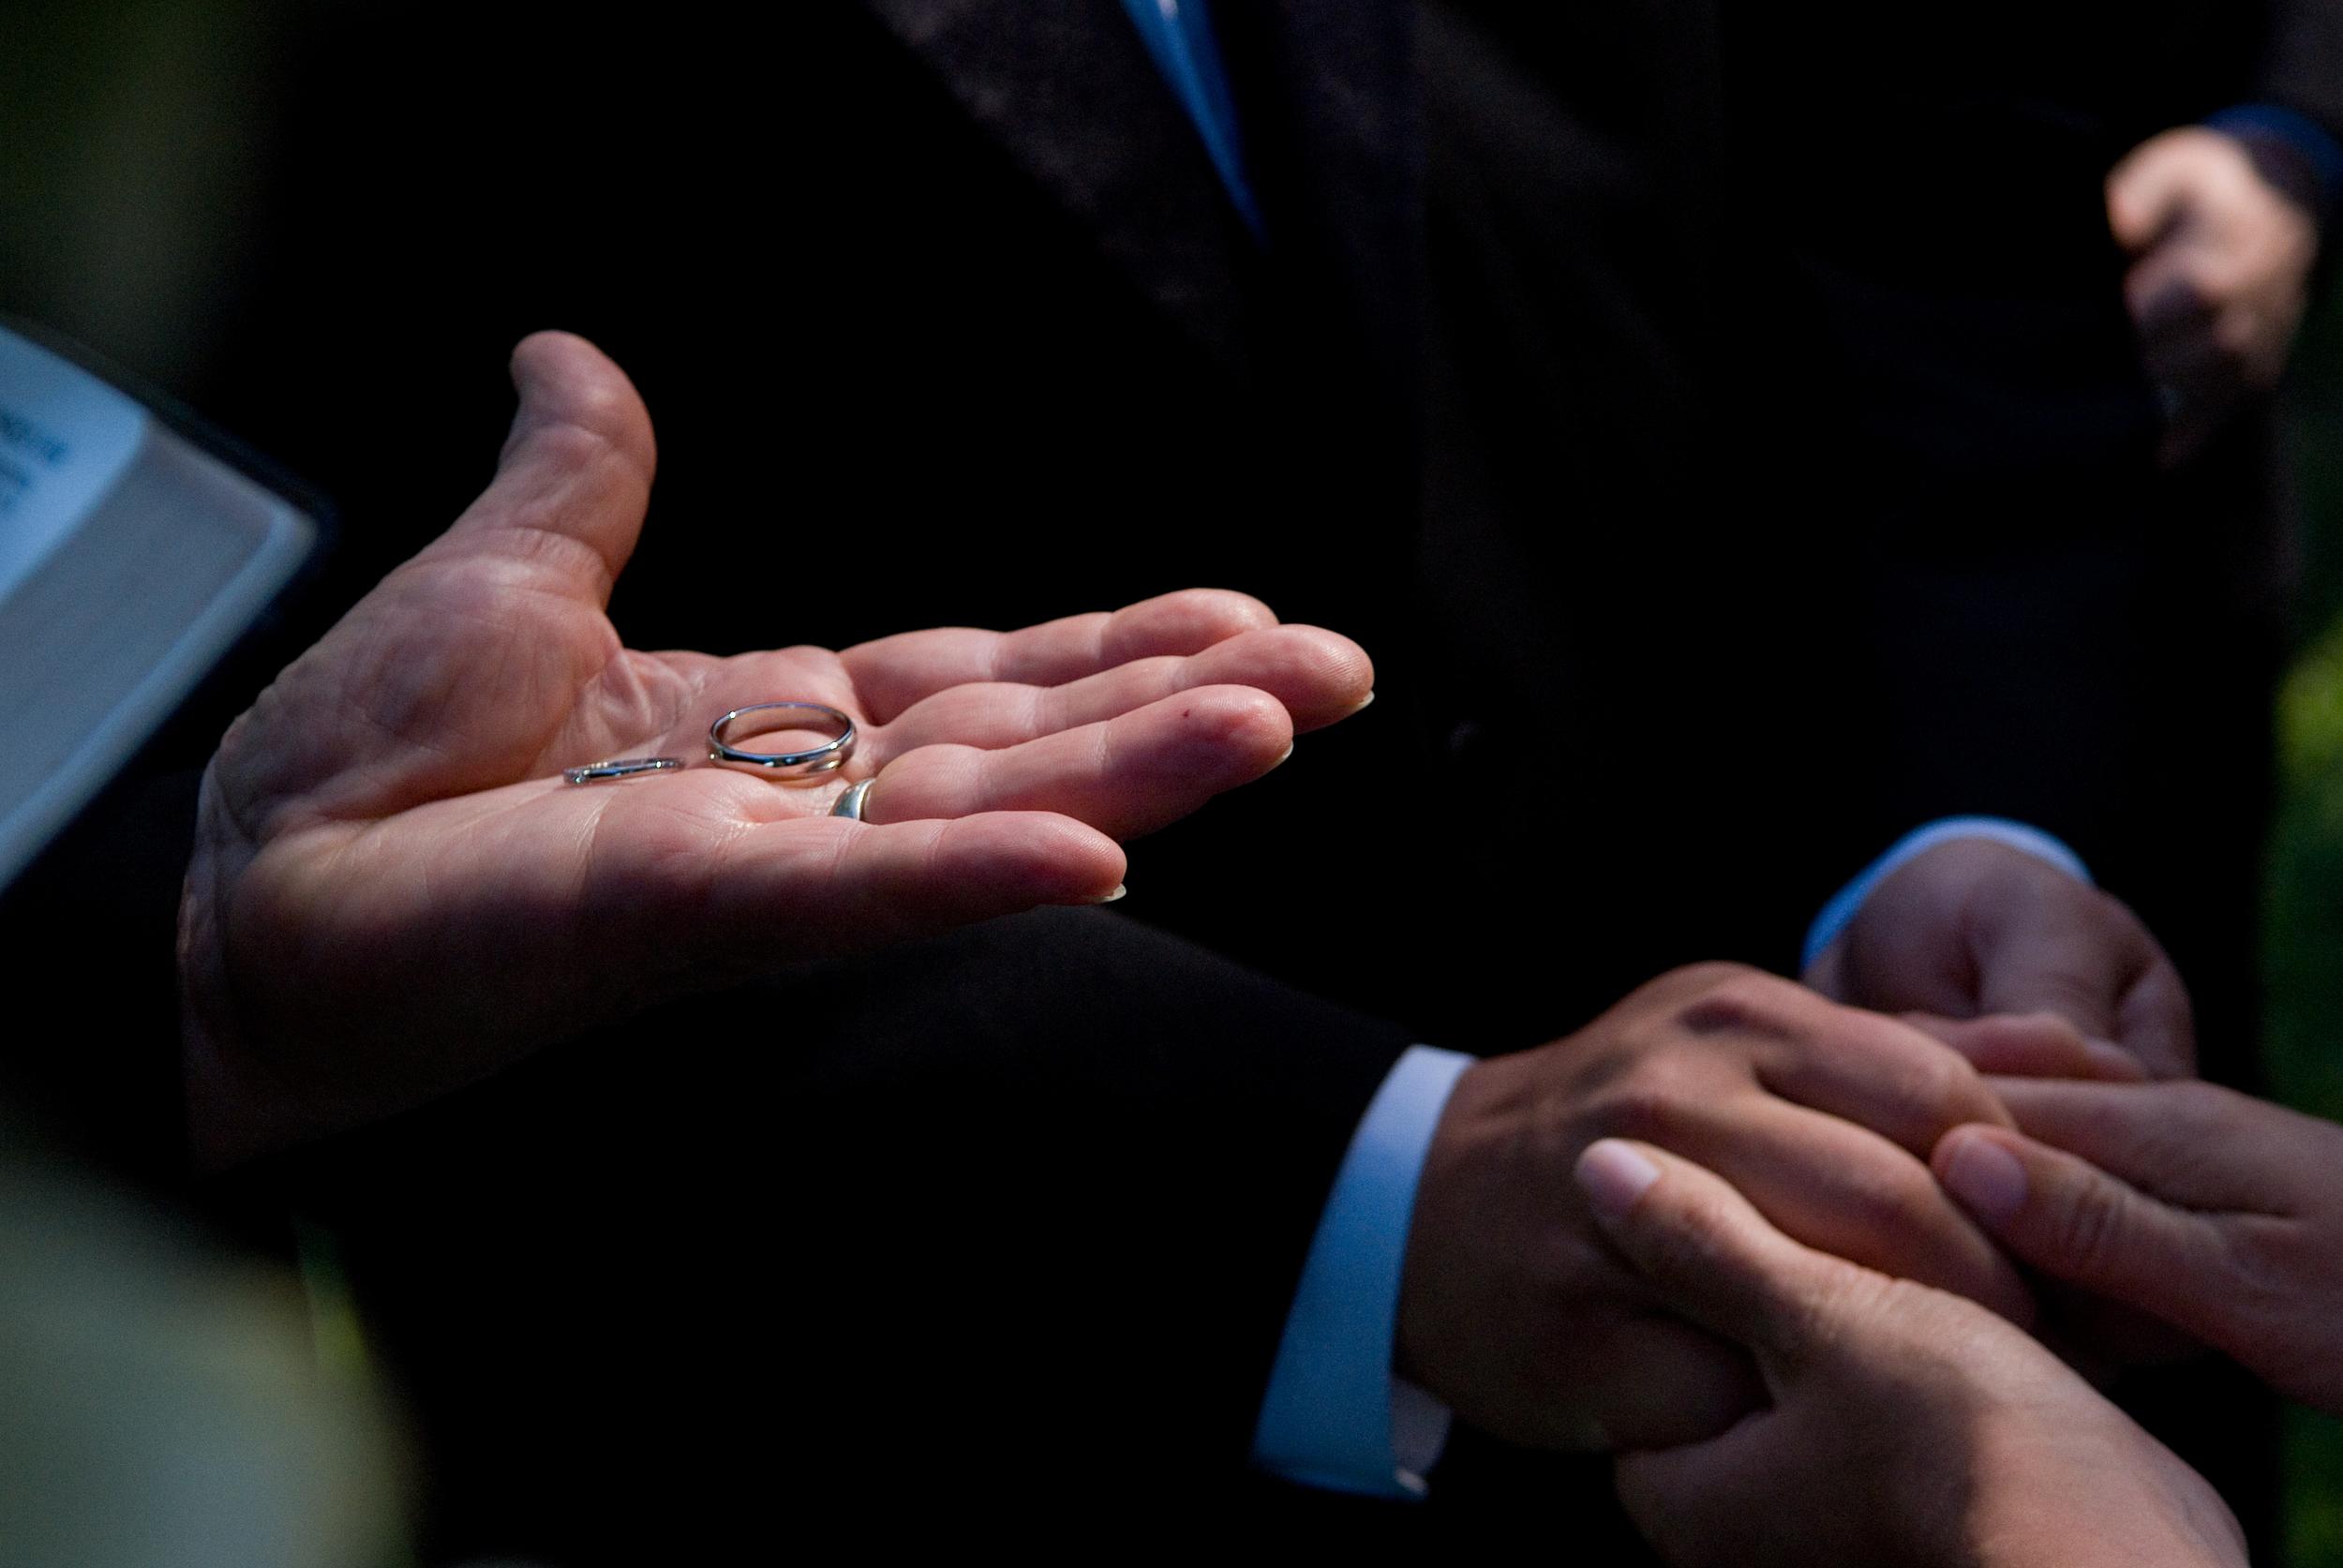 wedding_ring_ceremony.jpg